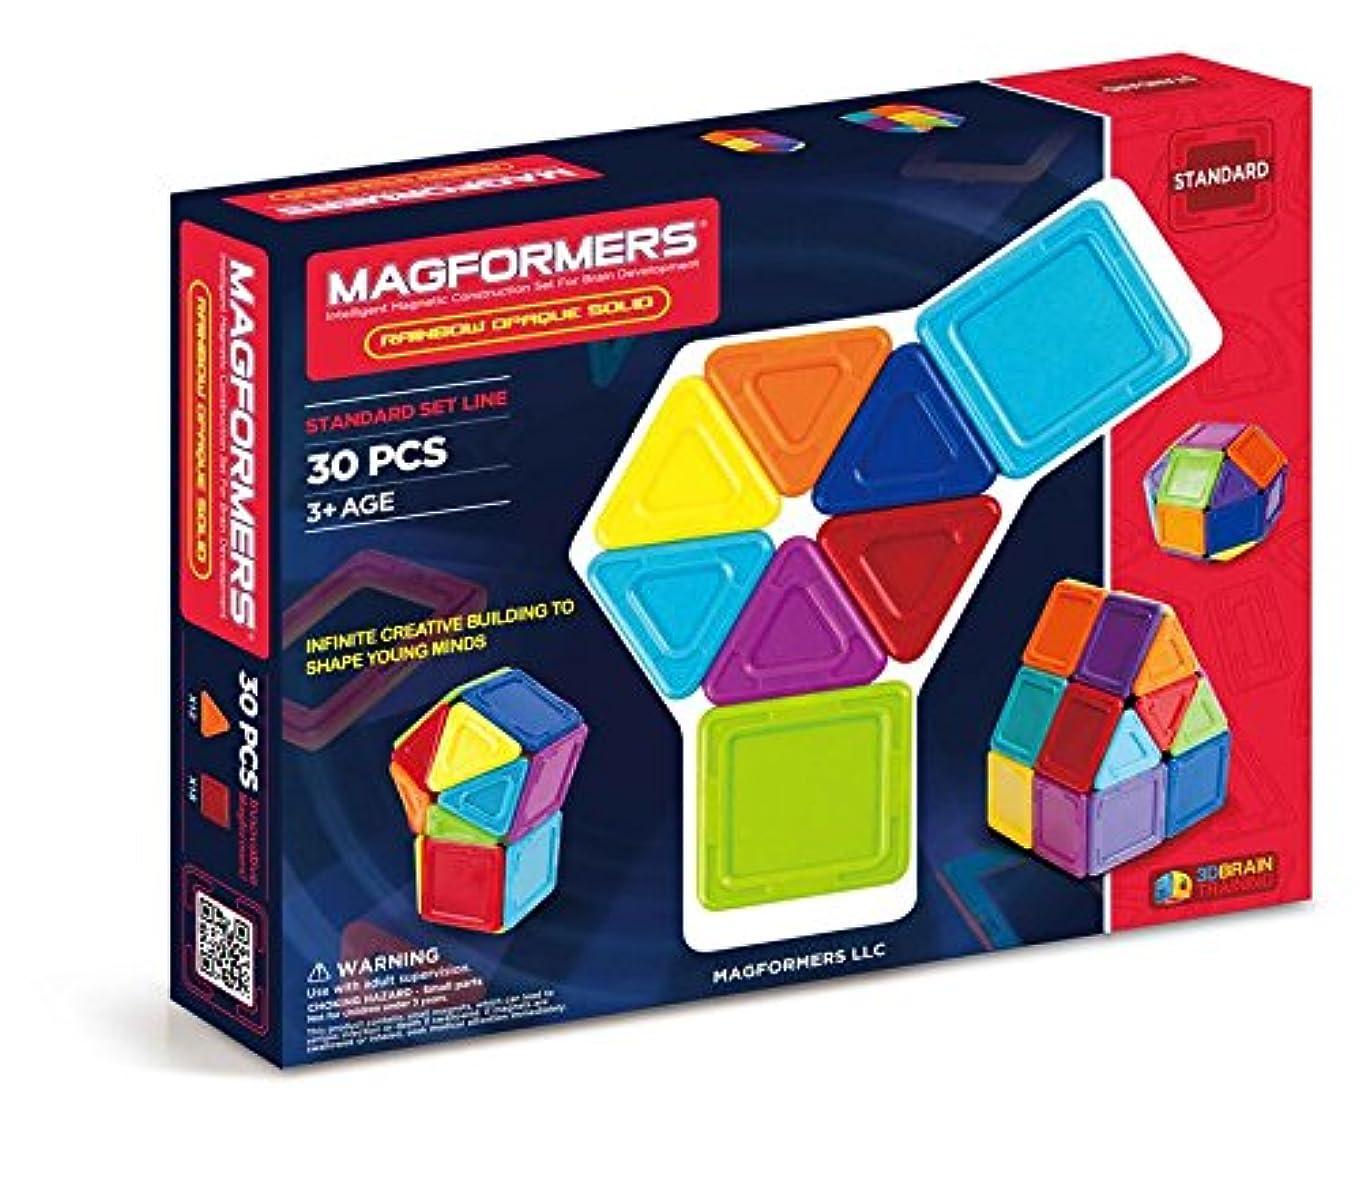 Magformers Rainbow Opaque Solid Set (30-pieces) Basic Magnetic    Building      Blocks, Educational  Magnetic    Tiles Kit , Magnetic    Construction  STEM Set